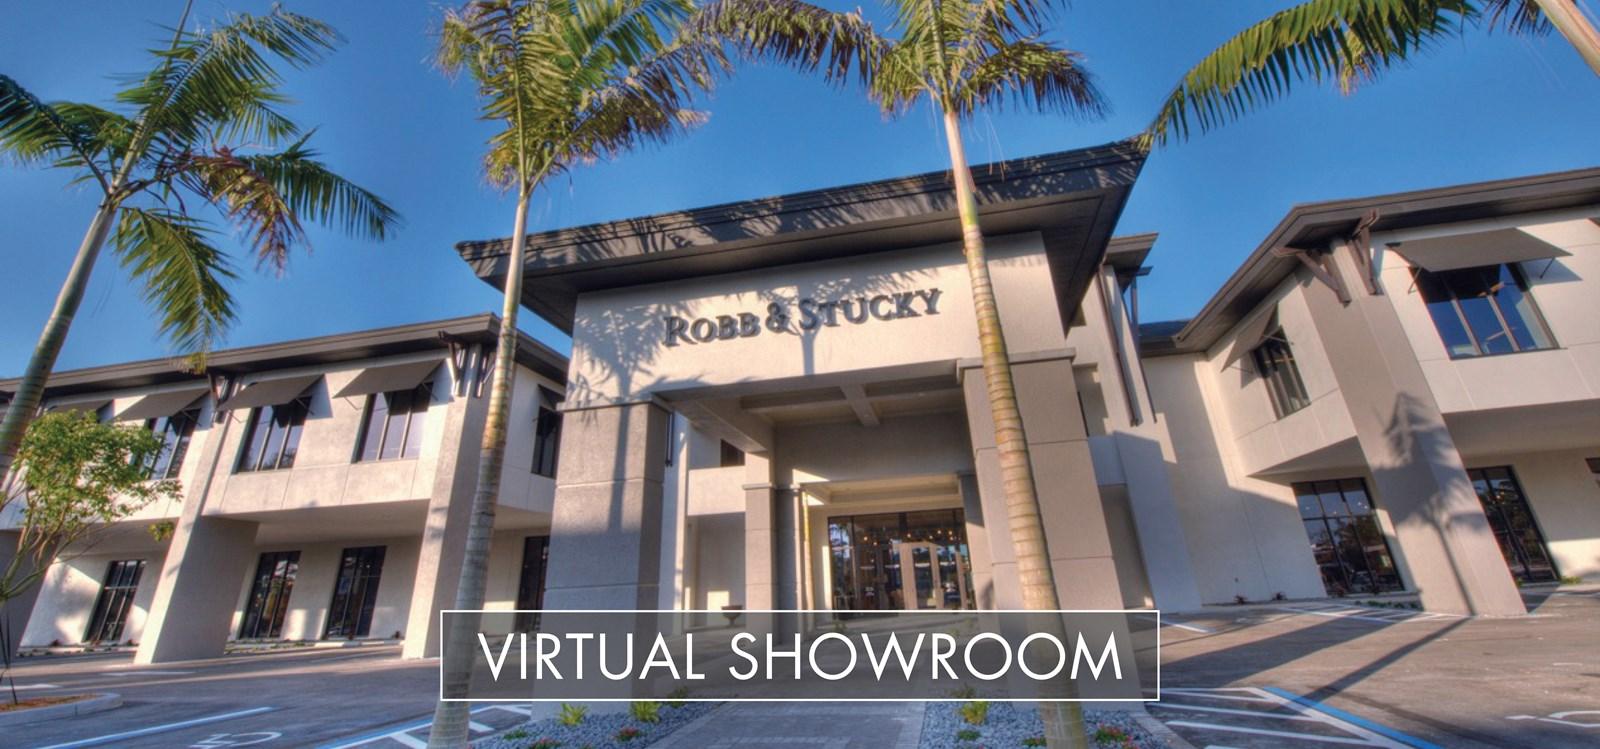 Link to R&S Virtual Showroom